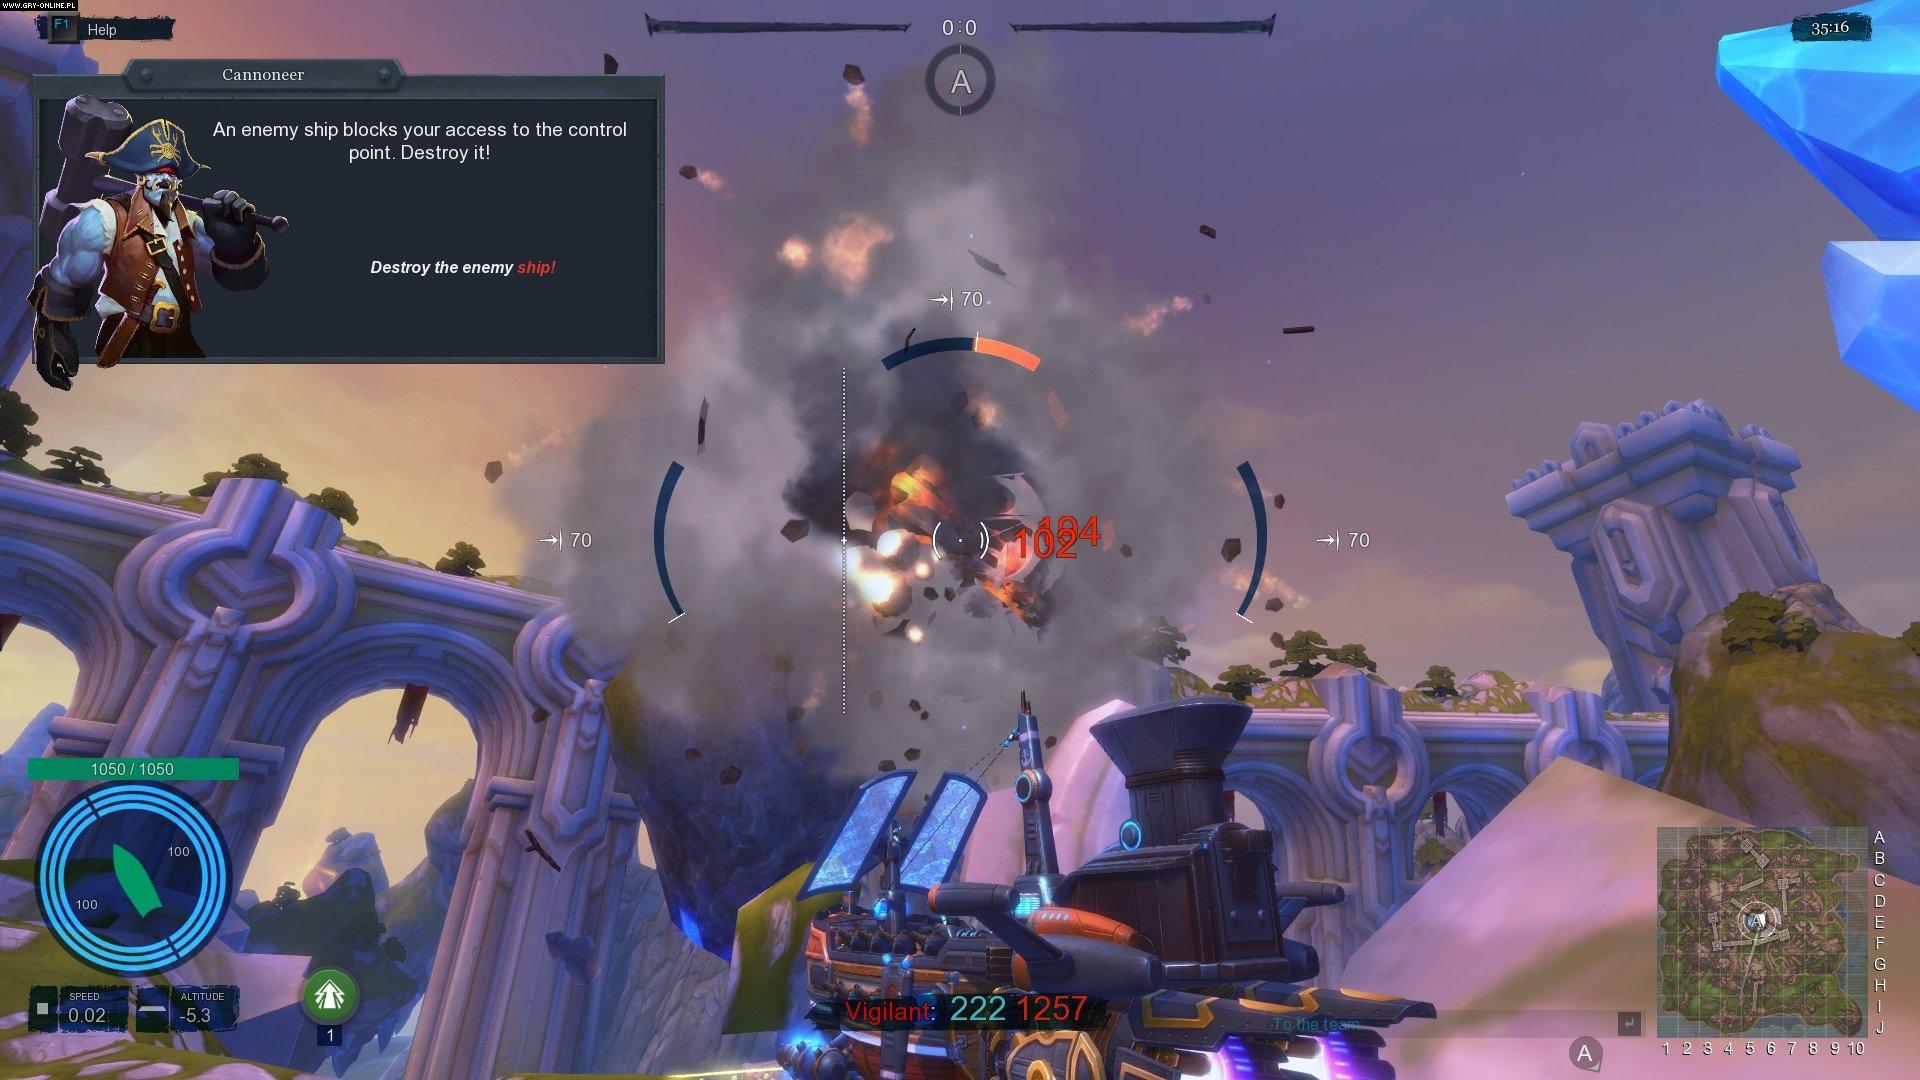 Cloud Pirates PC Games Image 3/12, Allods Team, My.com